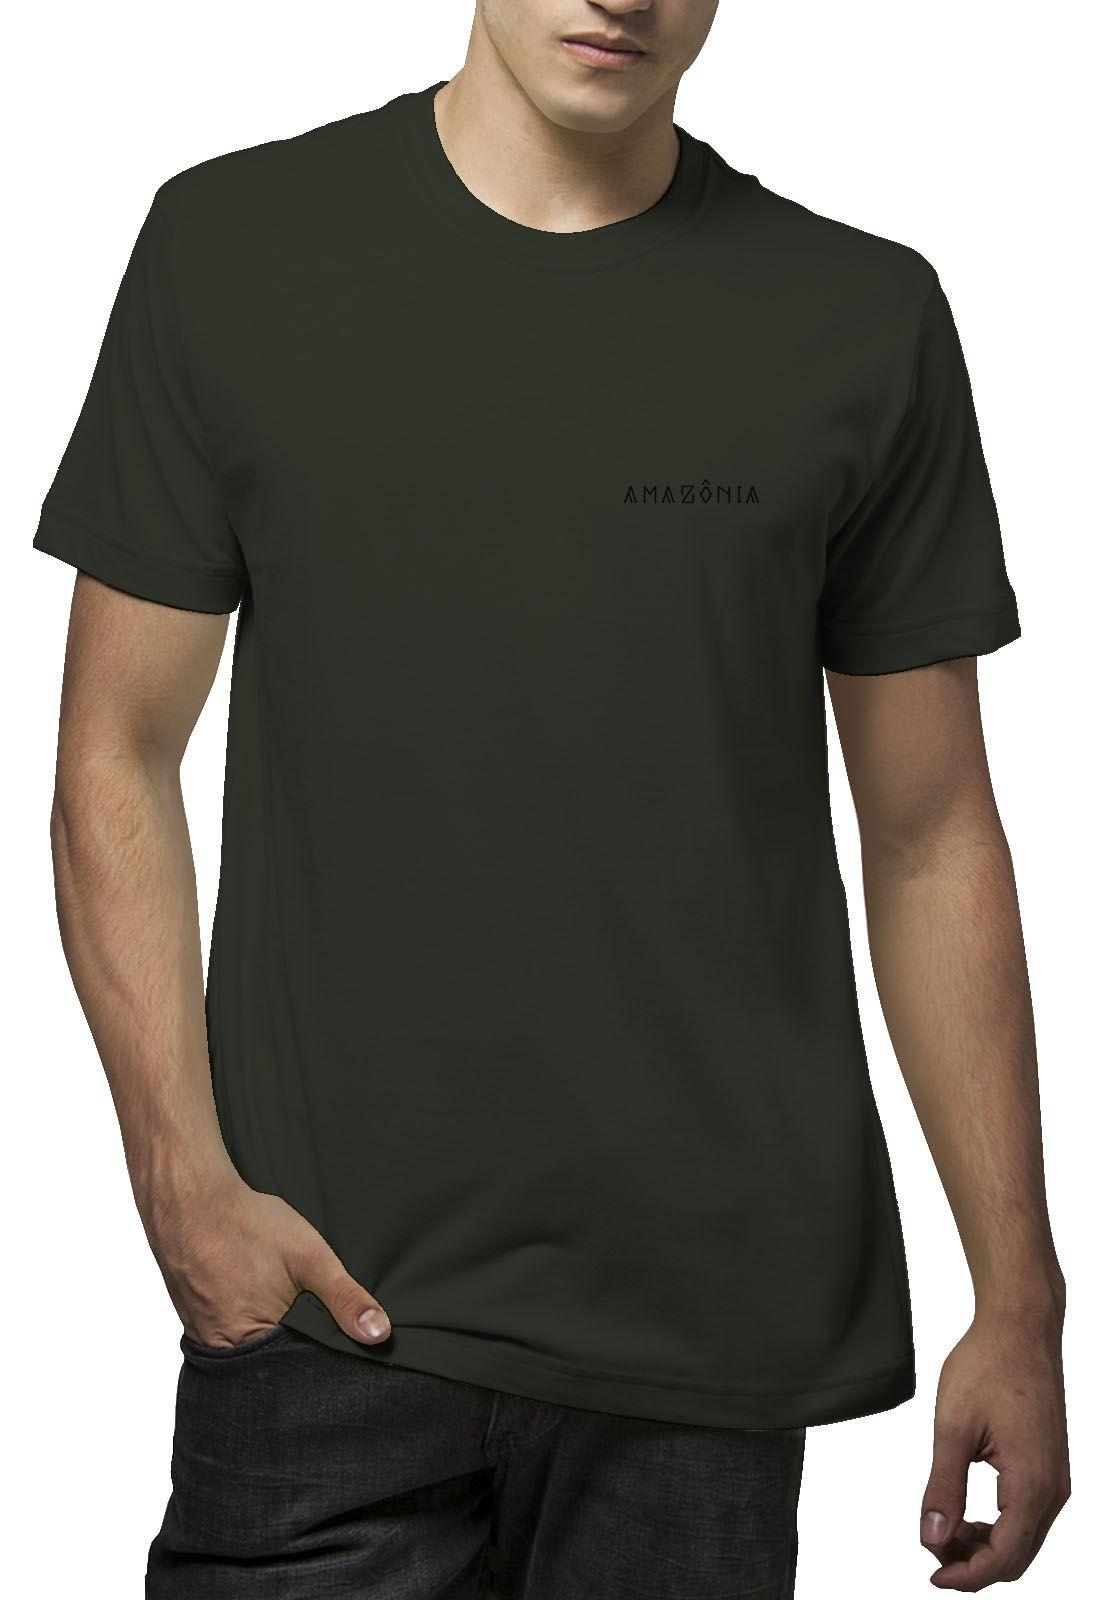 Camiseta Amazônia Tucano Tribal - Verde